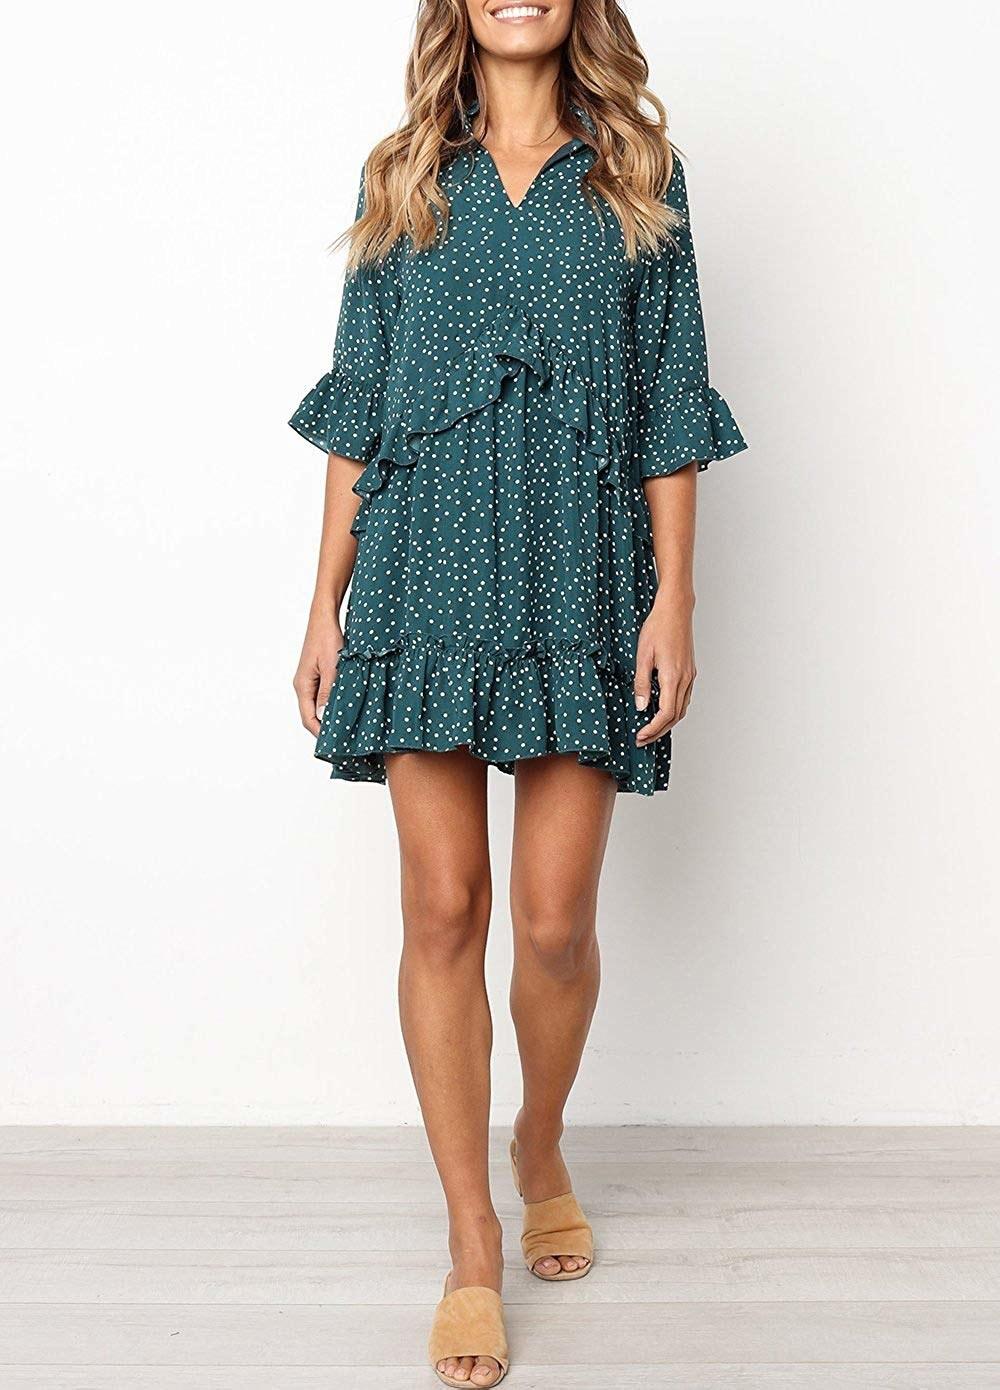 three quarter sleeve mini dress with ruffles and polka dots